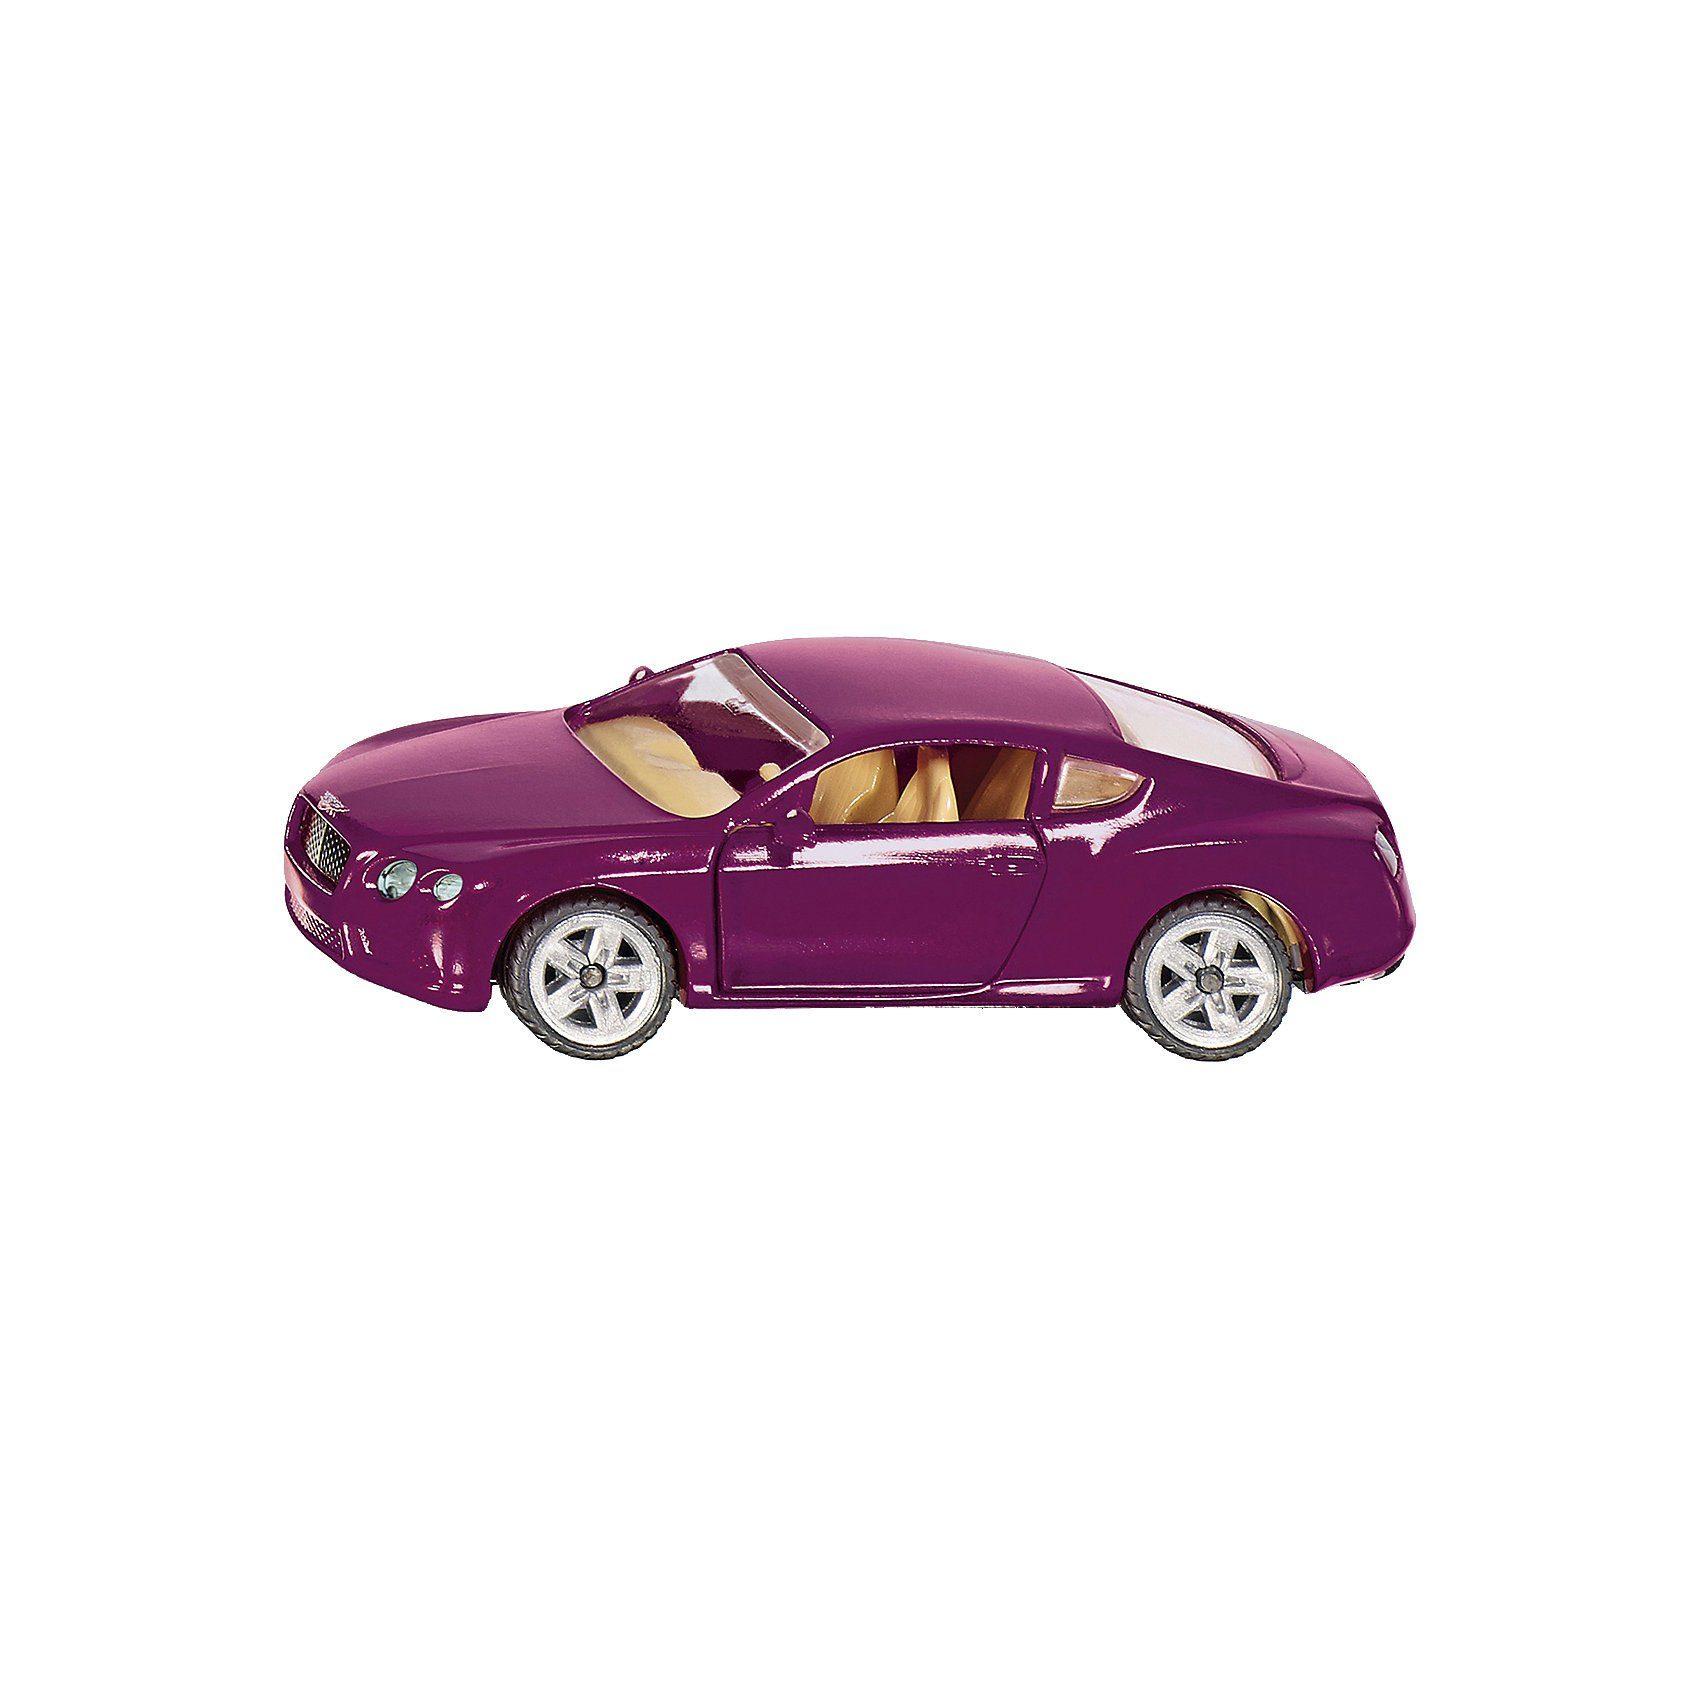 SIKU 1483 Bentley Continental GT V8S